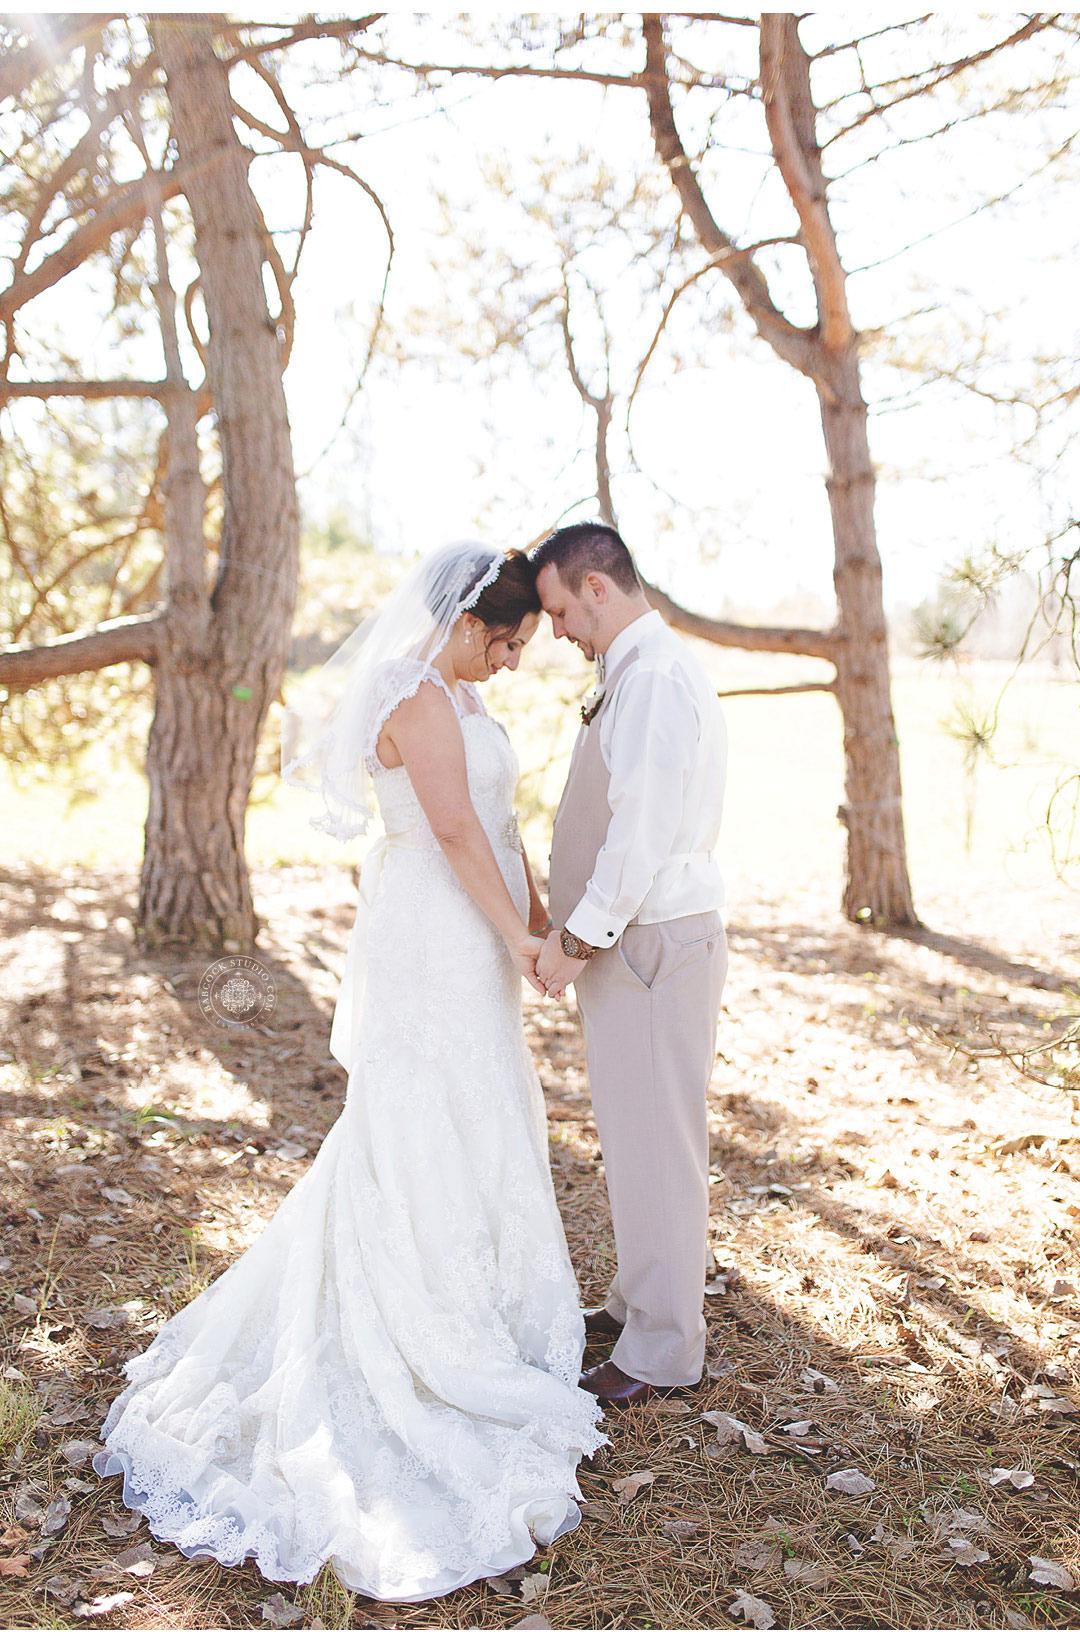 0014_sarah-john--dayton-wedding-photographer-cox-arboretum-11.jpg